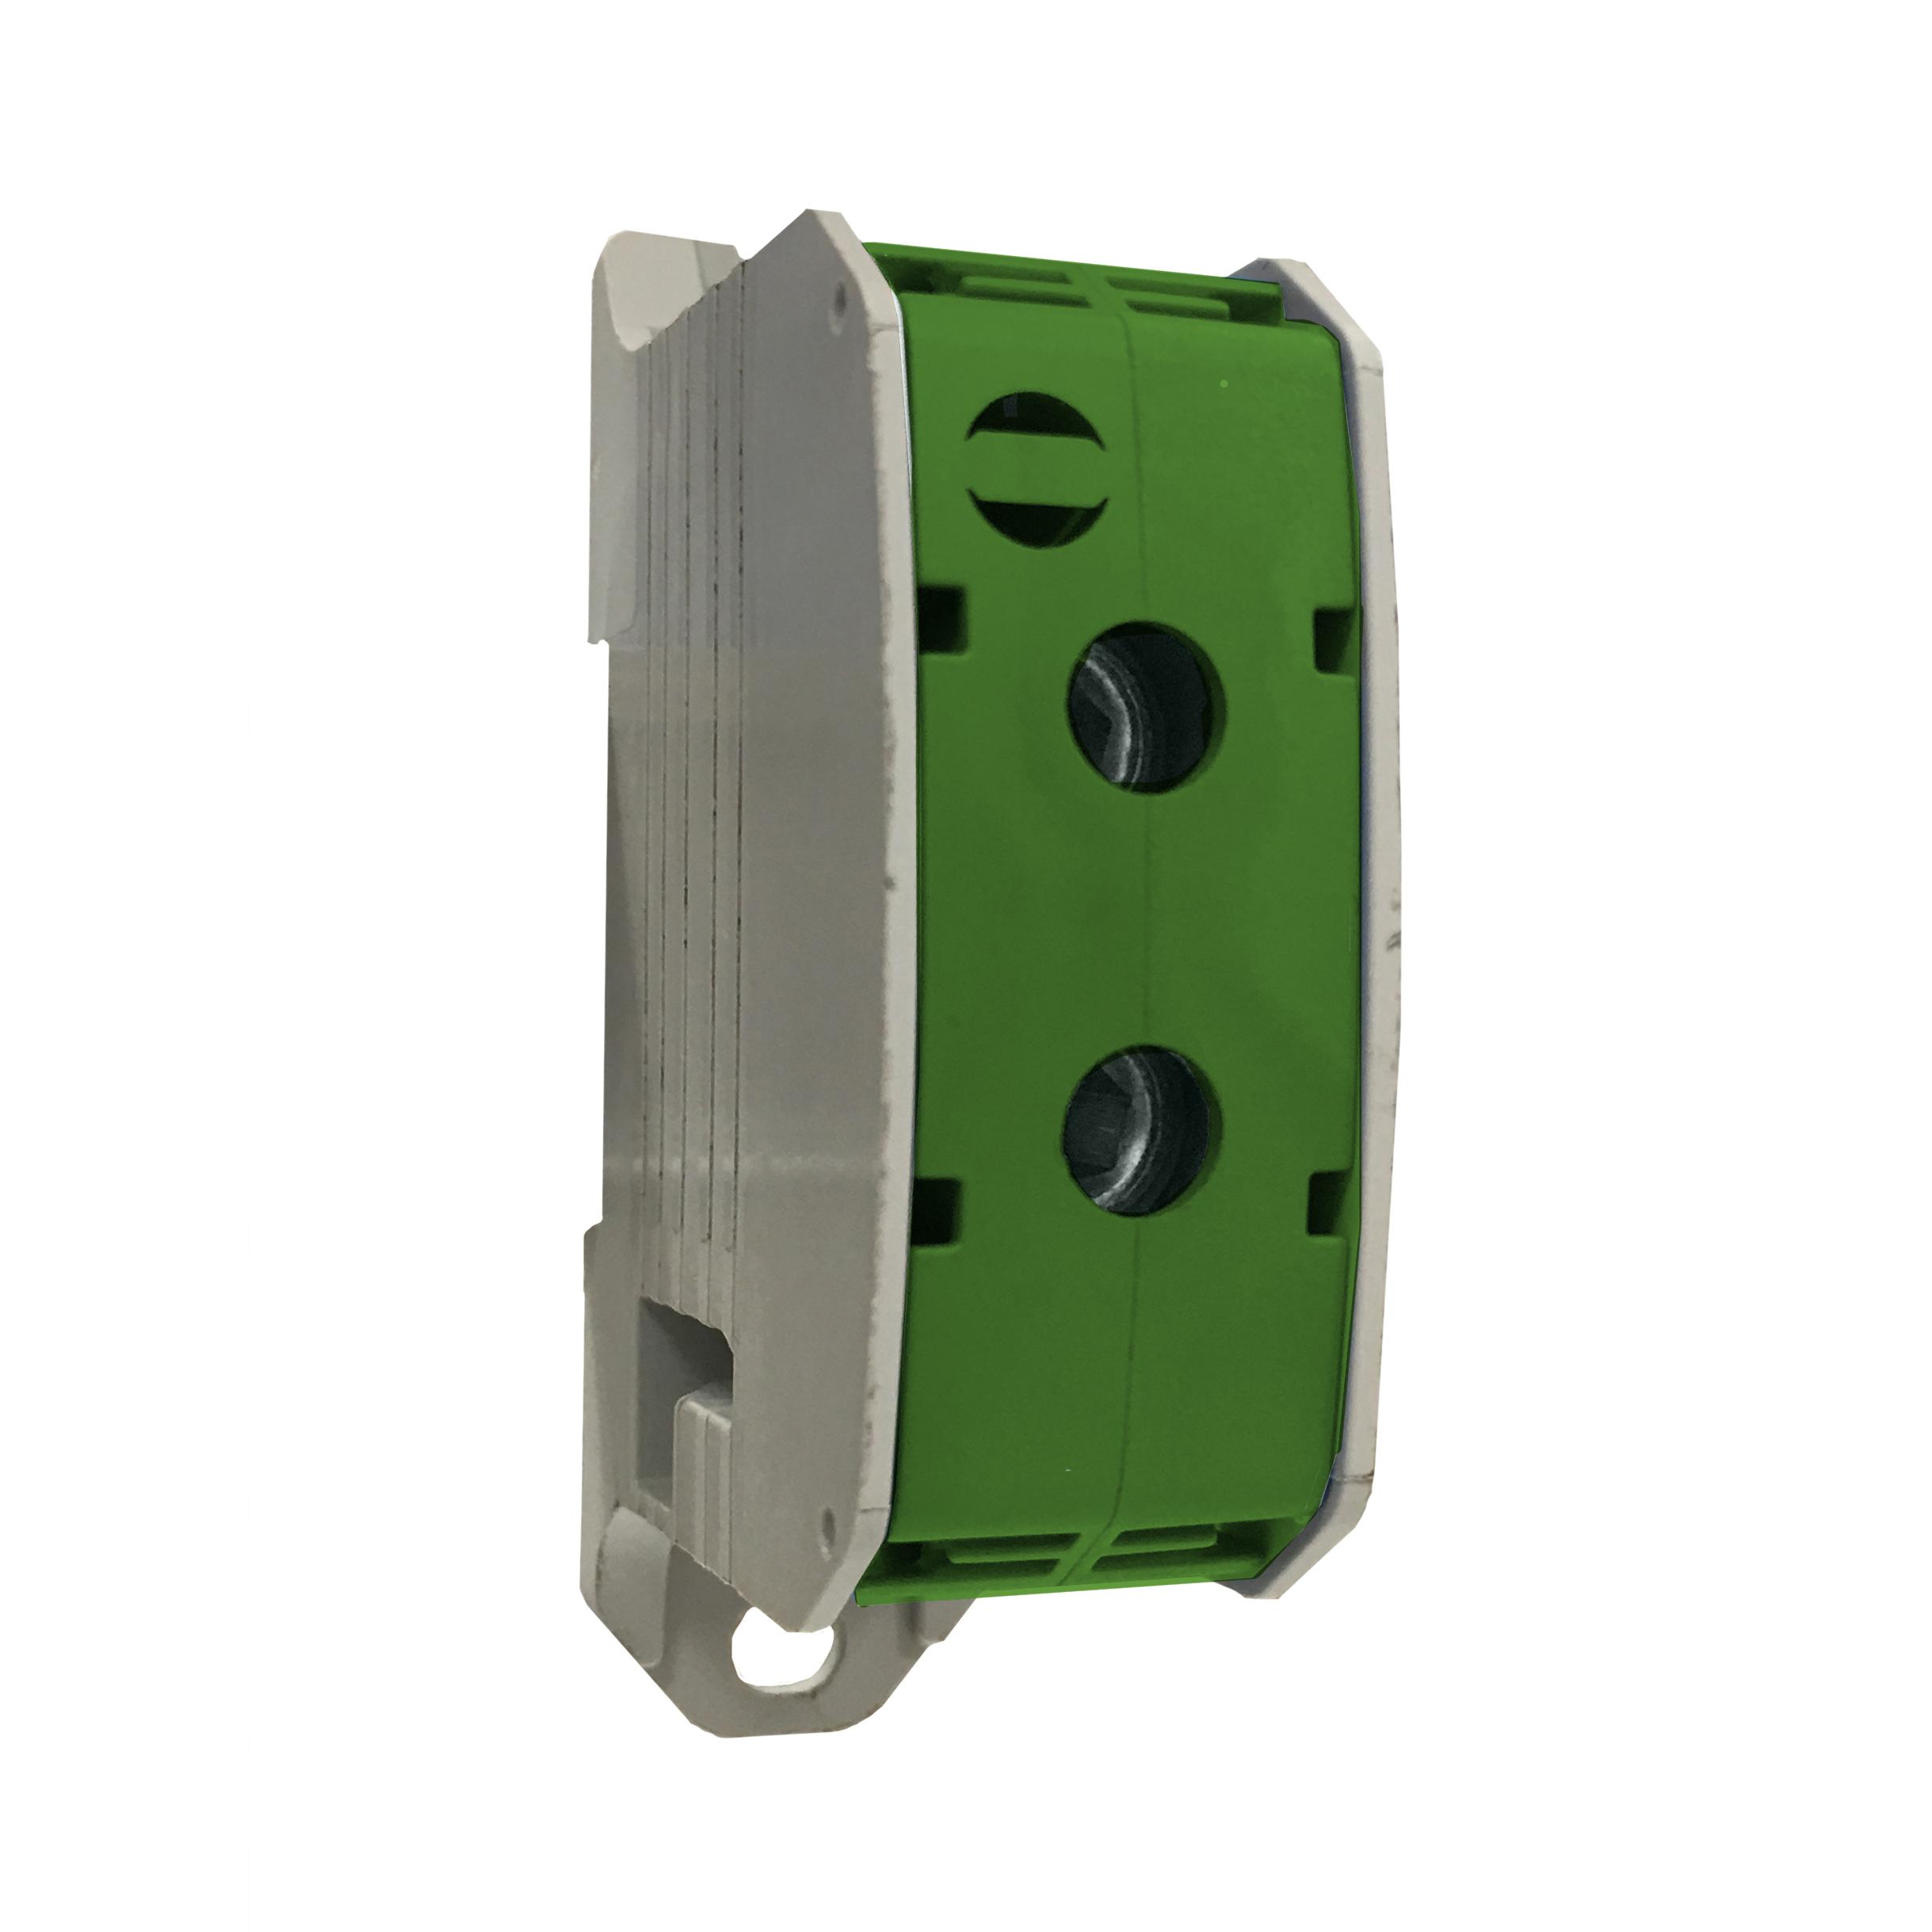 1 Stk Aluminium /Kupfer Klemme, 1-polig, 185mm² grün IKA21530--